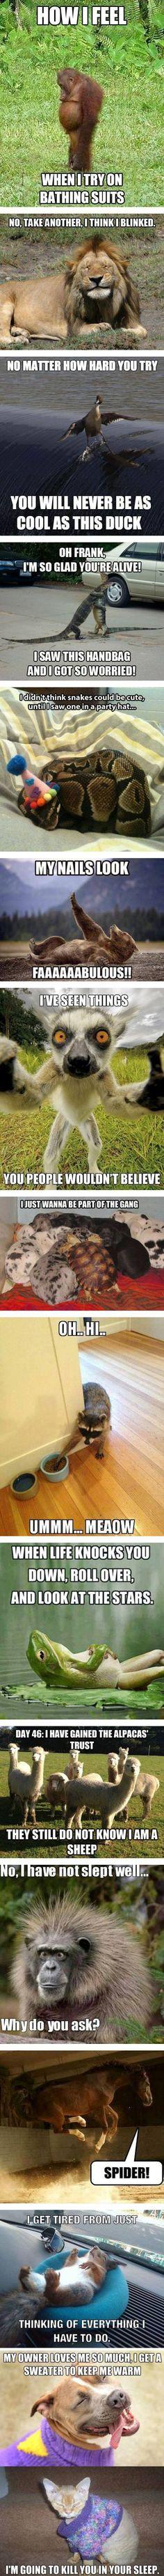 longest animal meme